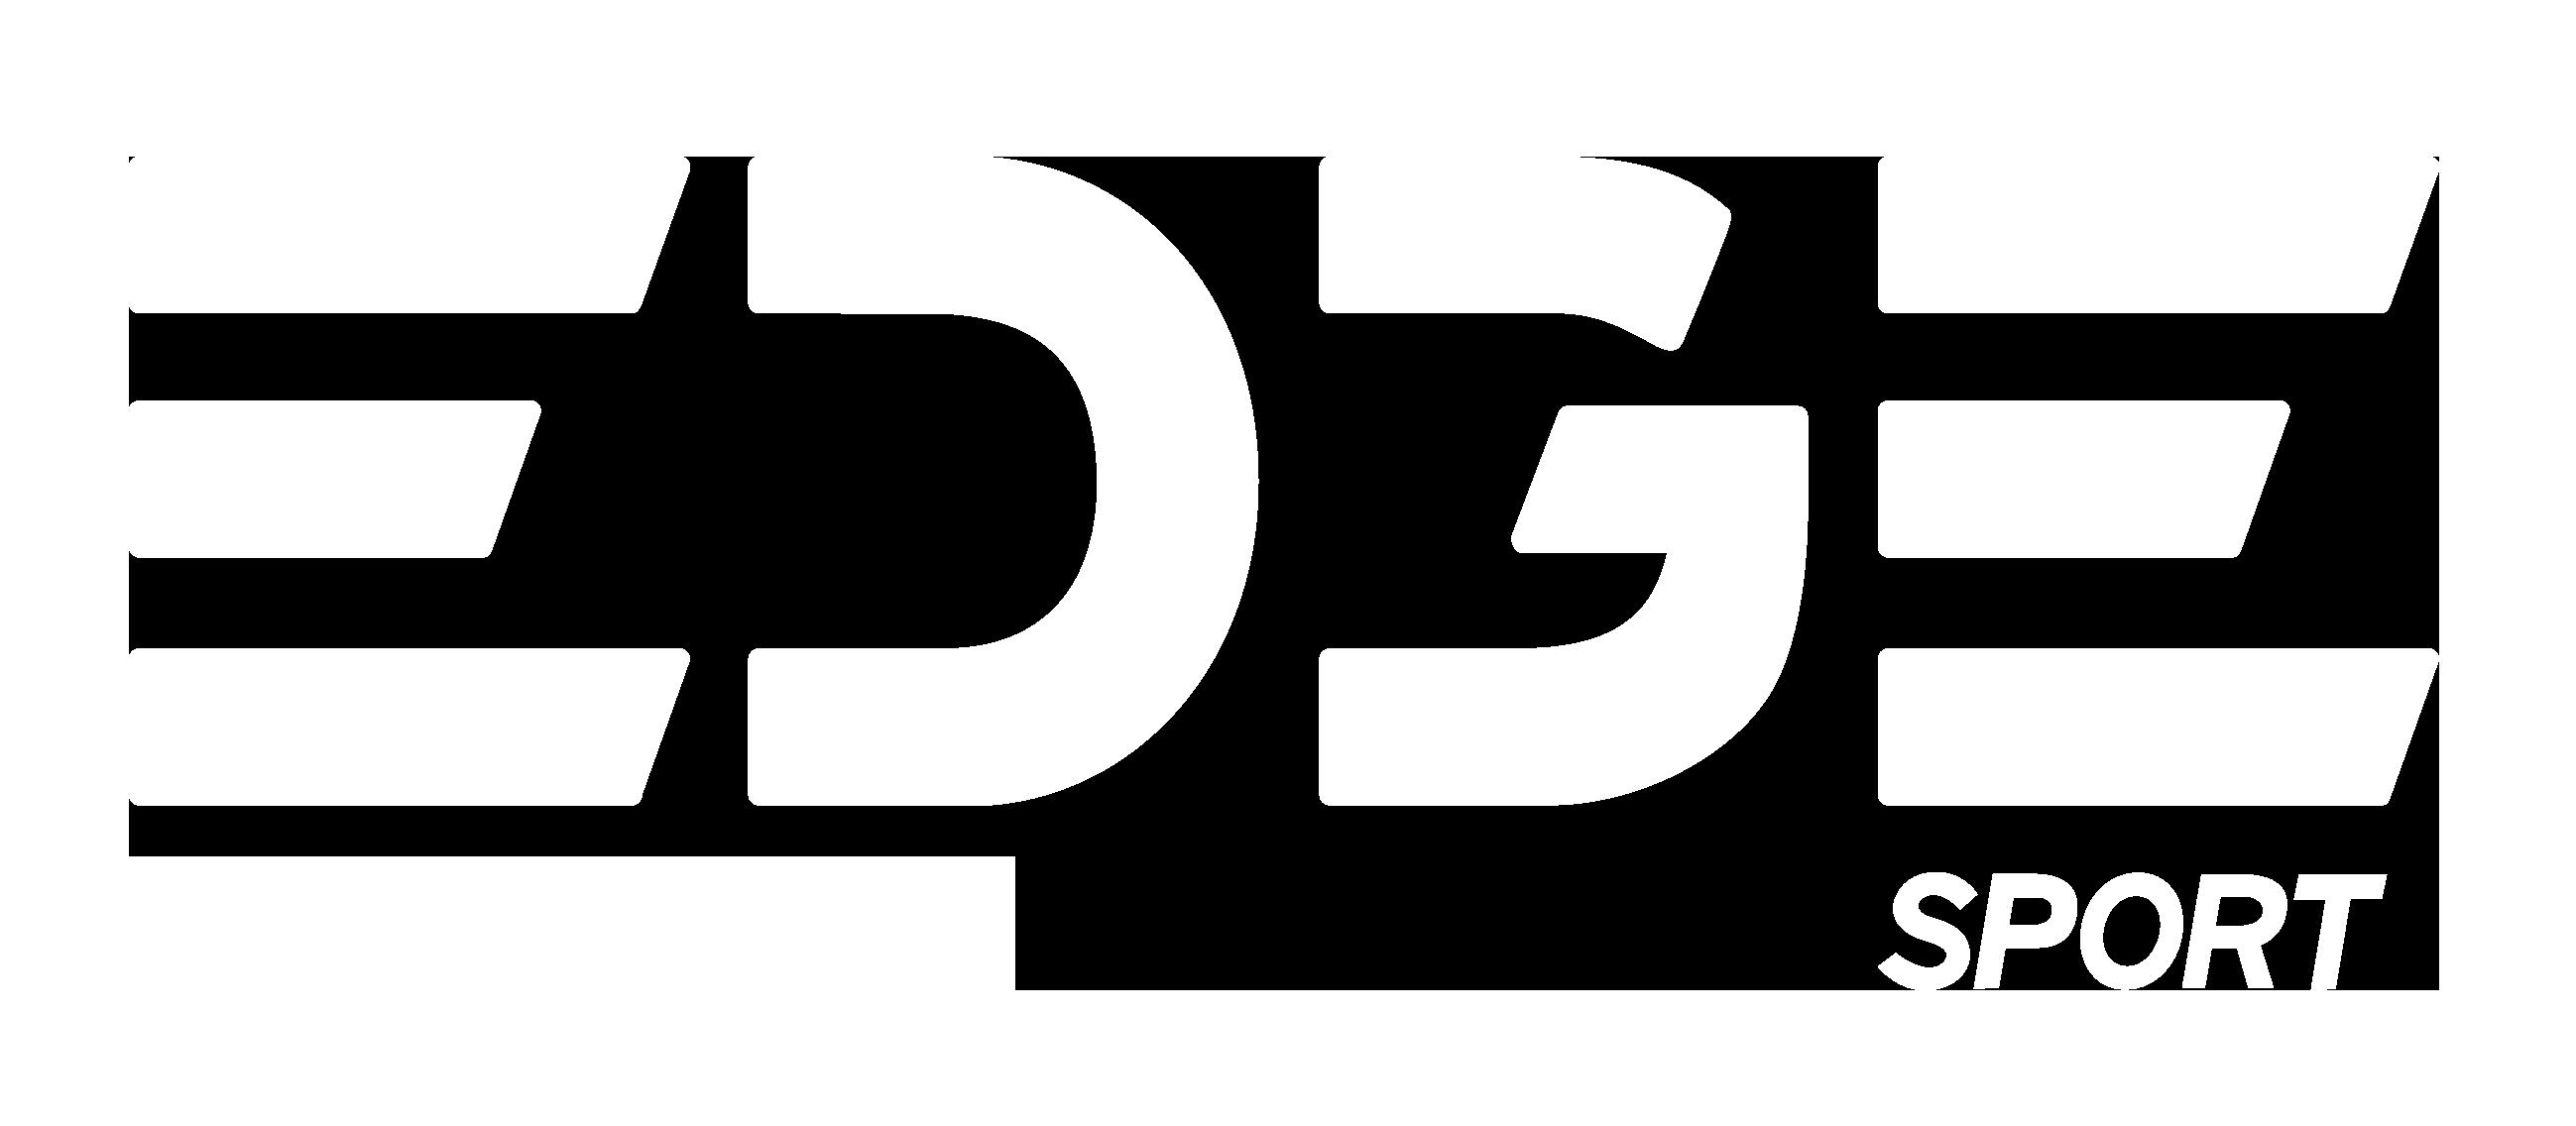 Fernsehkanal Logo